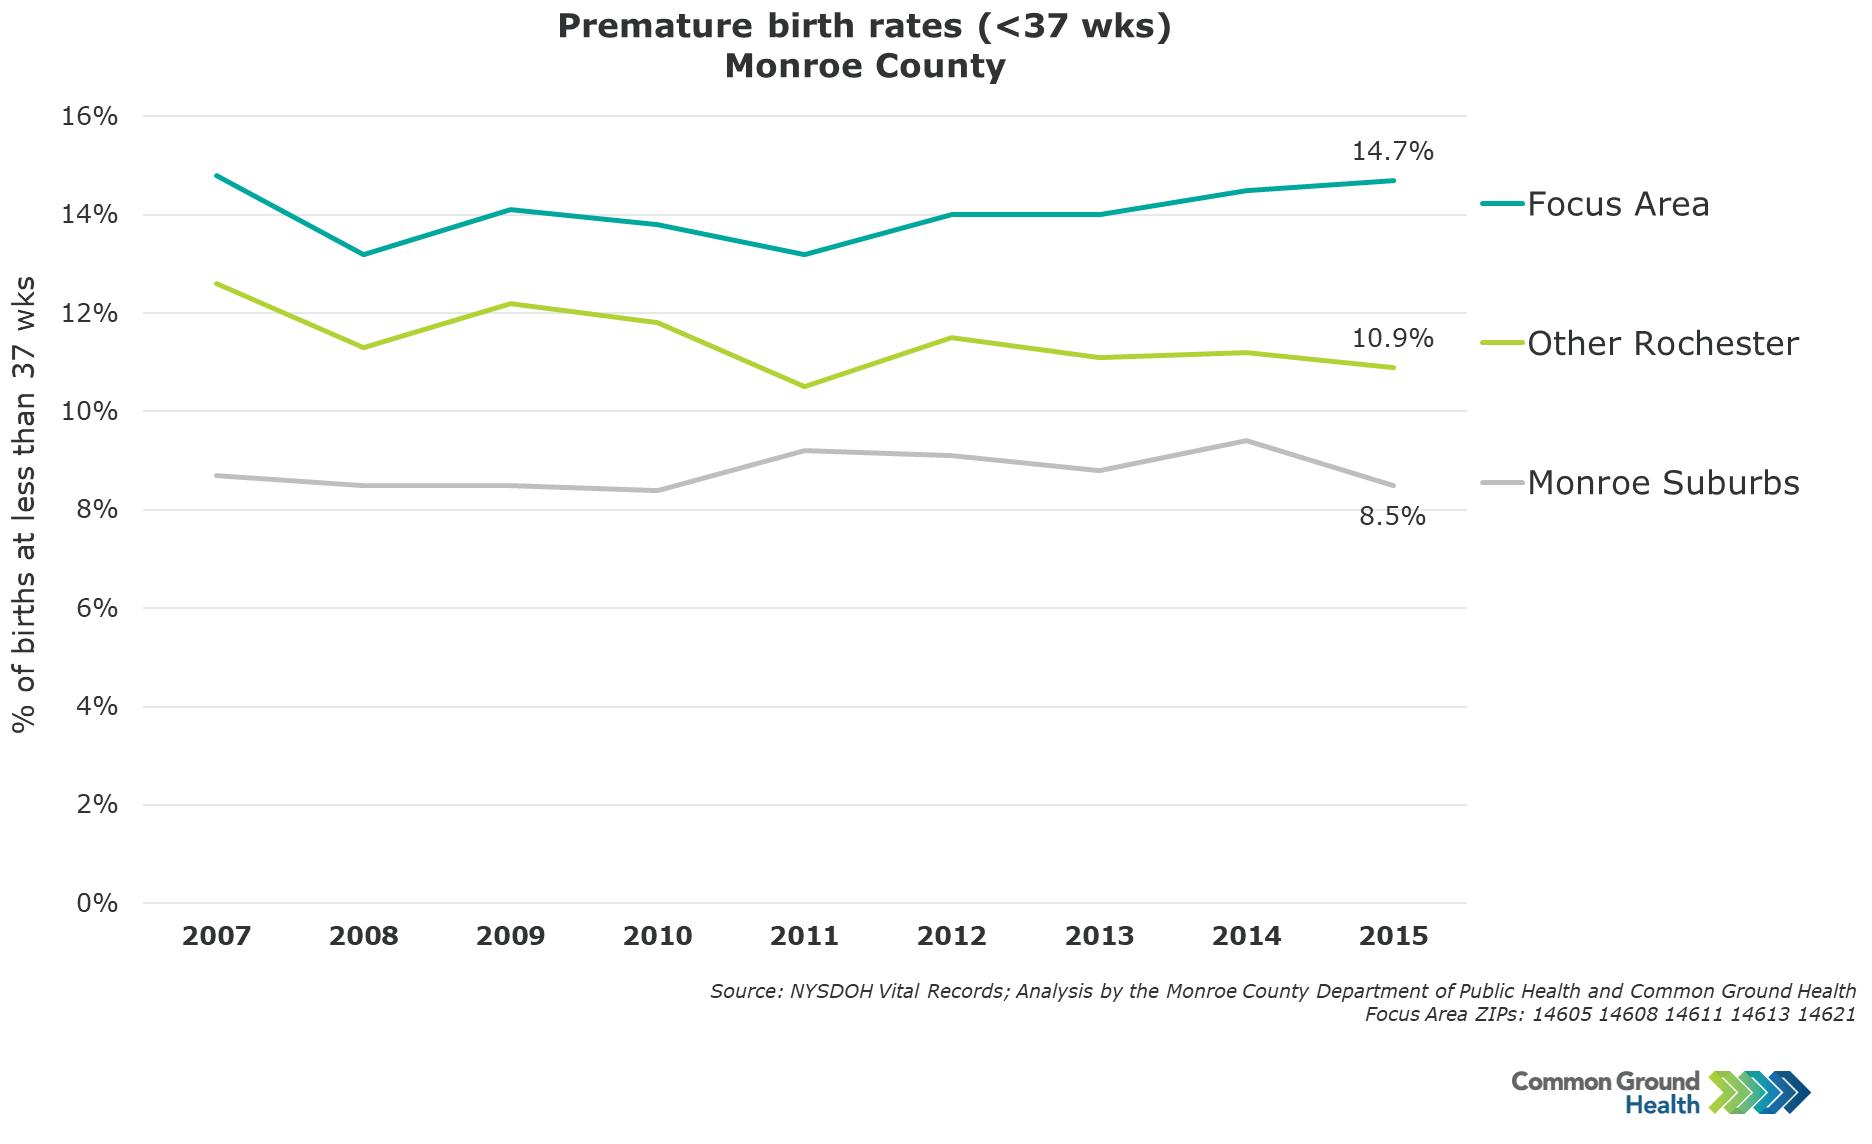 Premature Birth Rates (<37 weeks)